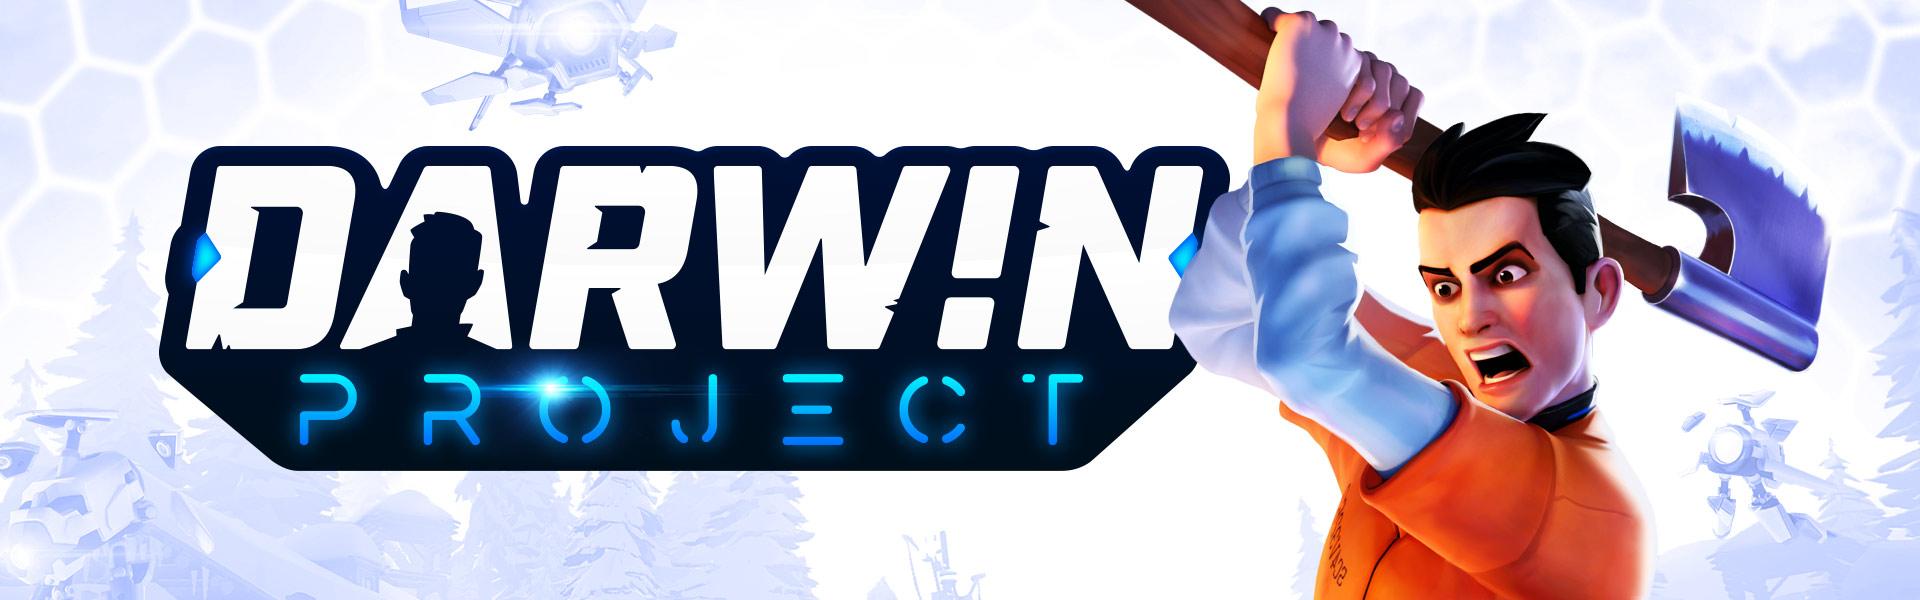 Darwin Project,男人將斧頭高舉過頭,同時小型飛行機器人看著他